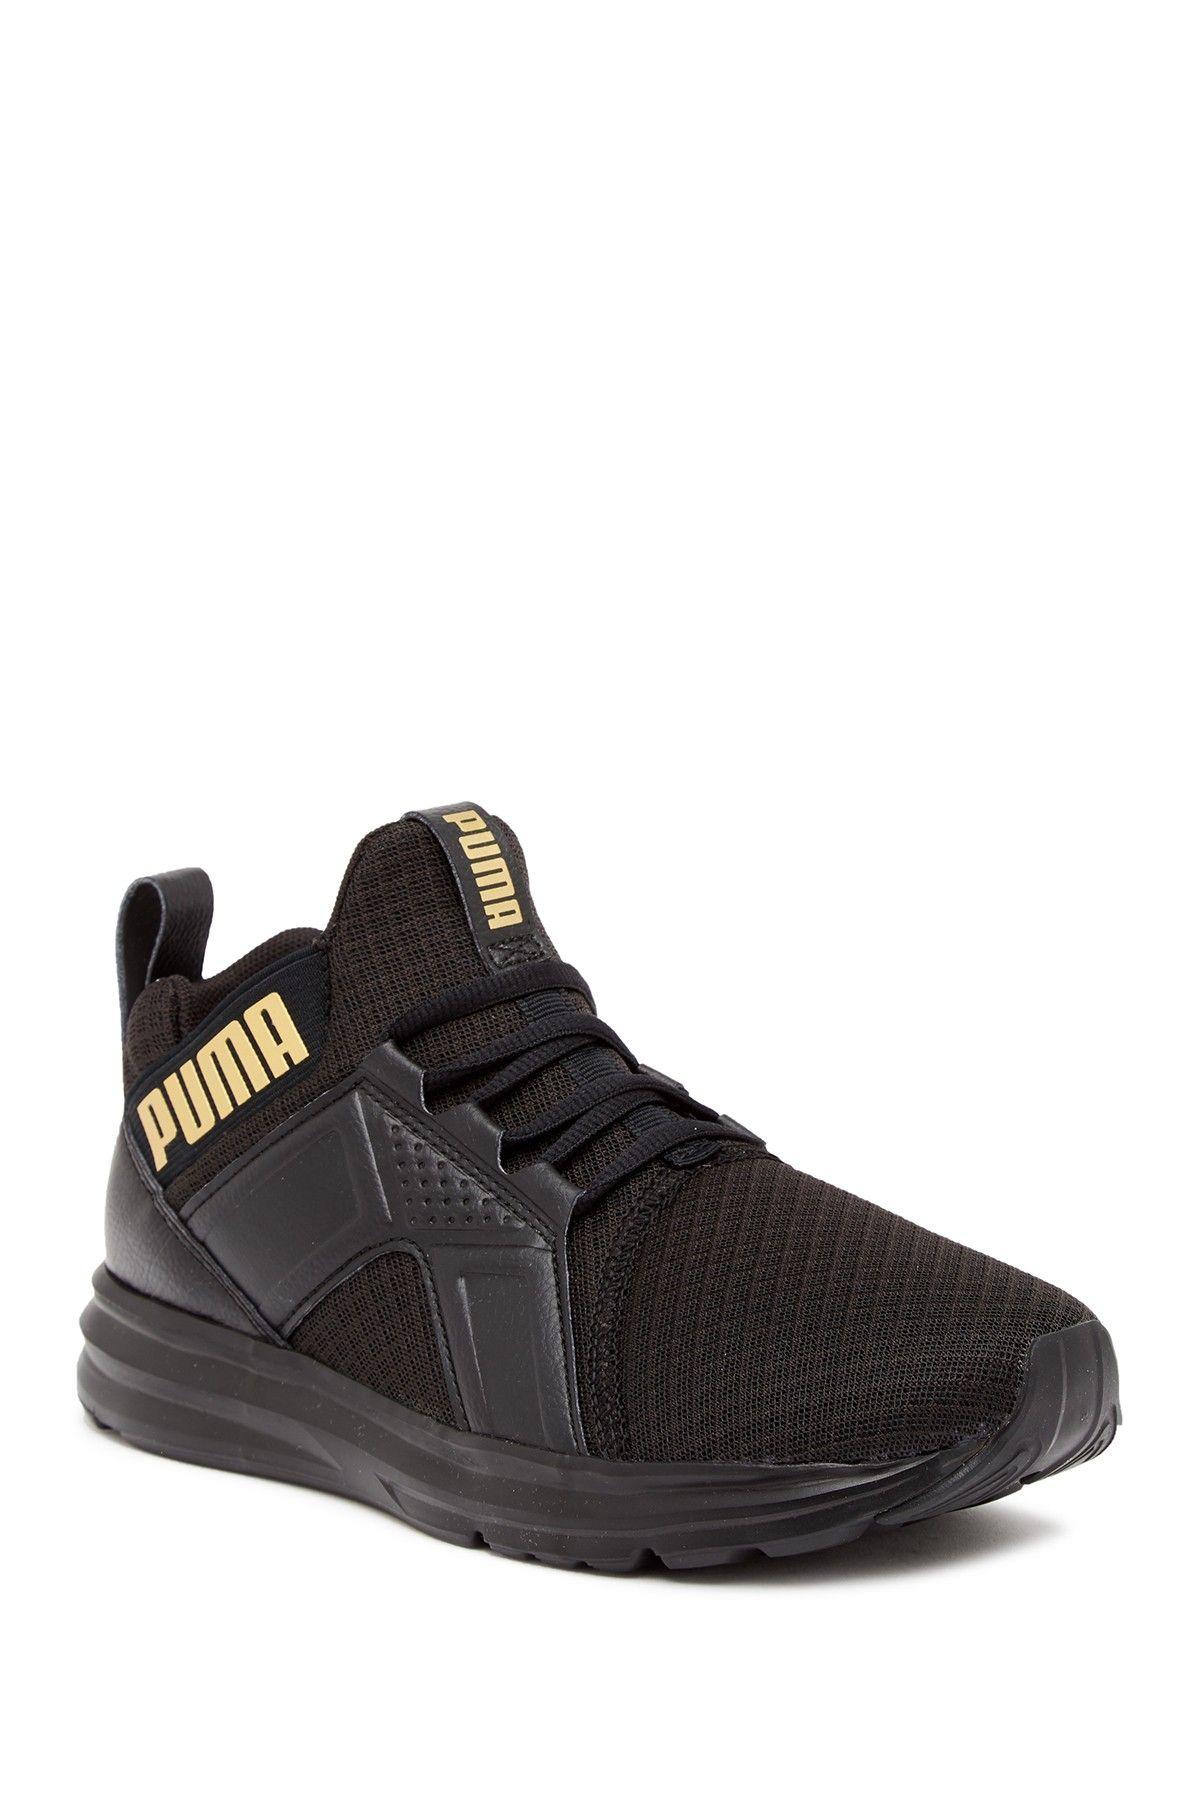 0778f2d189c Enzo Premium Mesh Sneaker by PUMA on  nordstrom rack